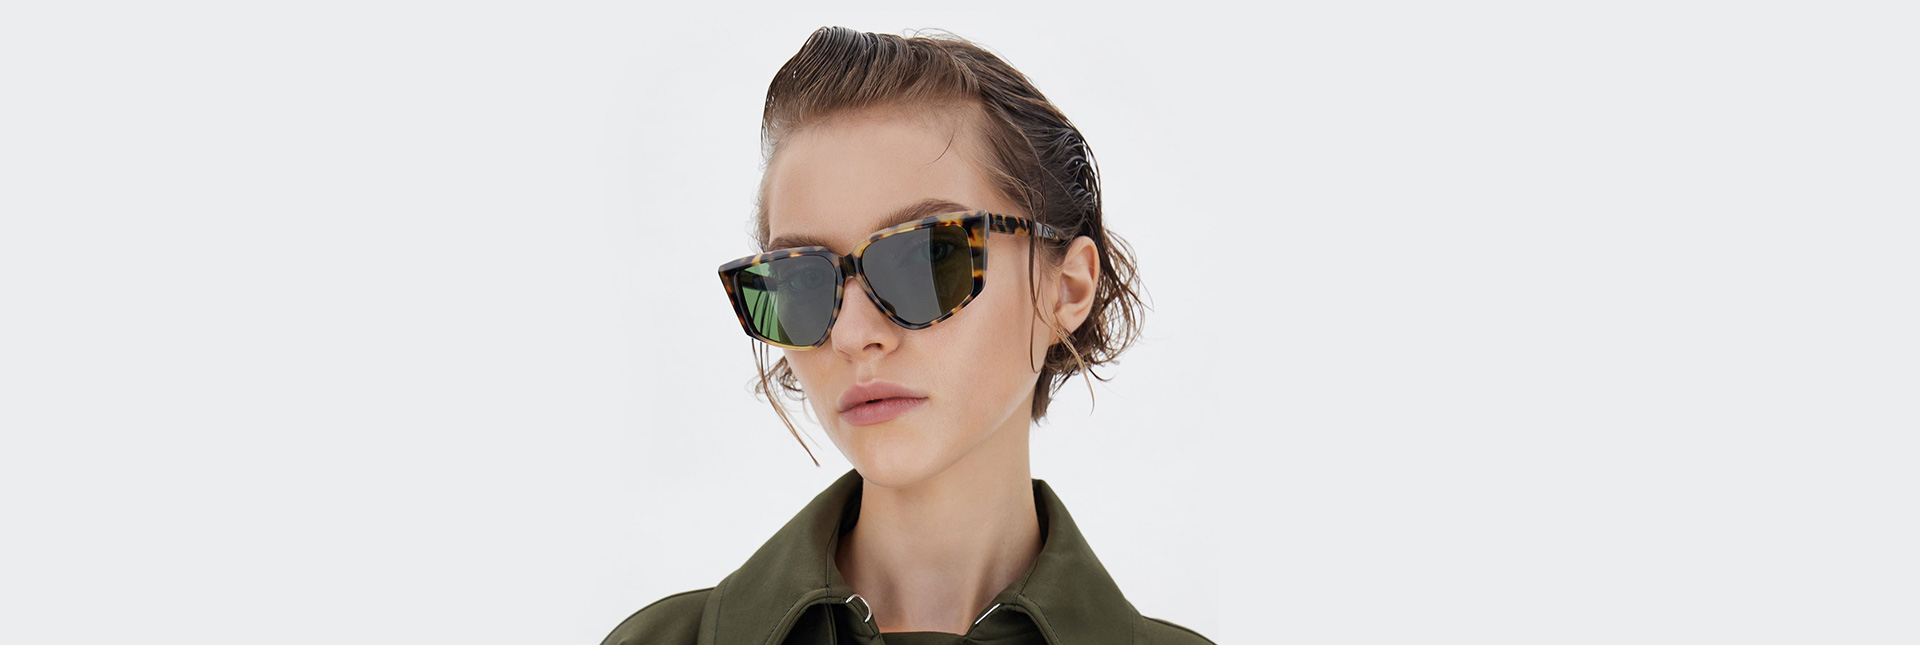 Sportmax® Sunglasses